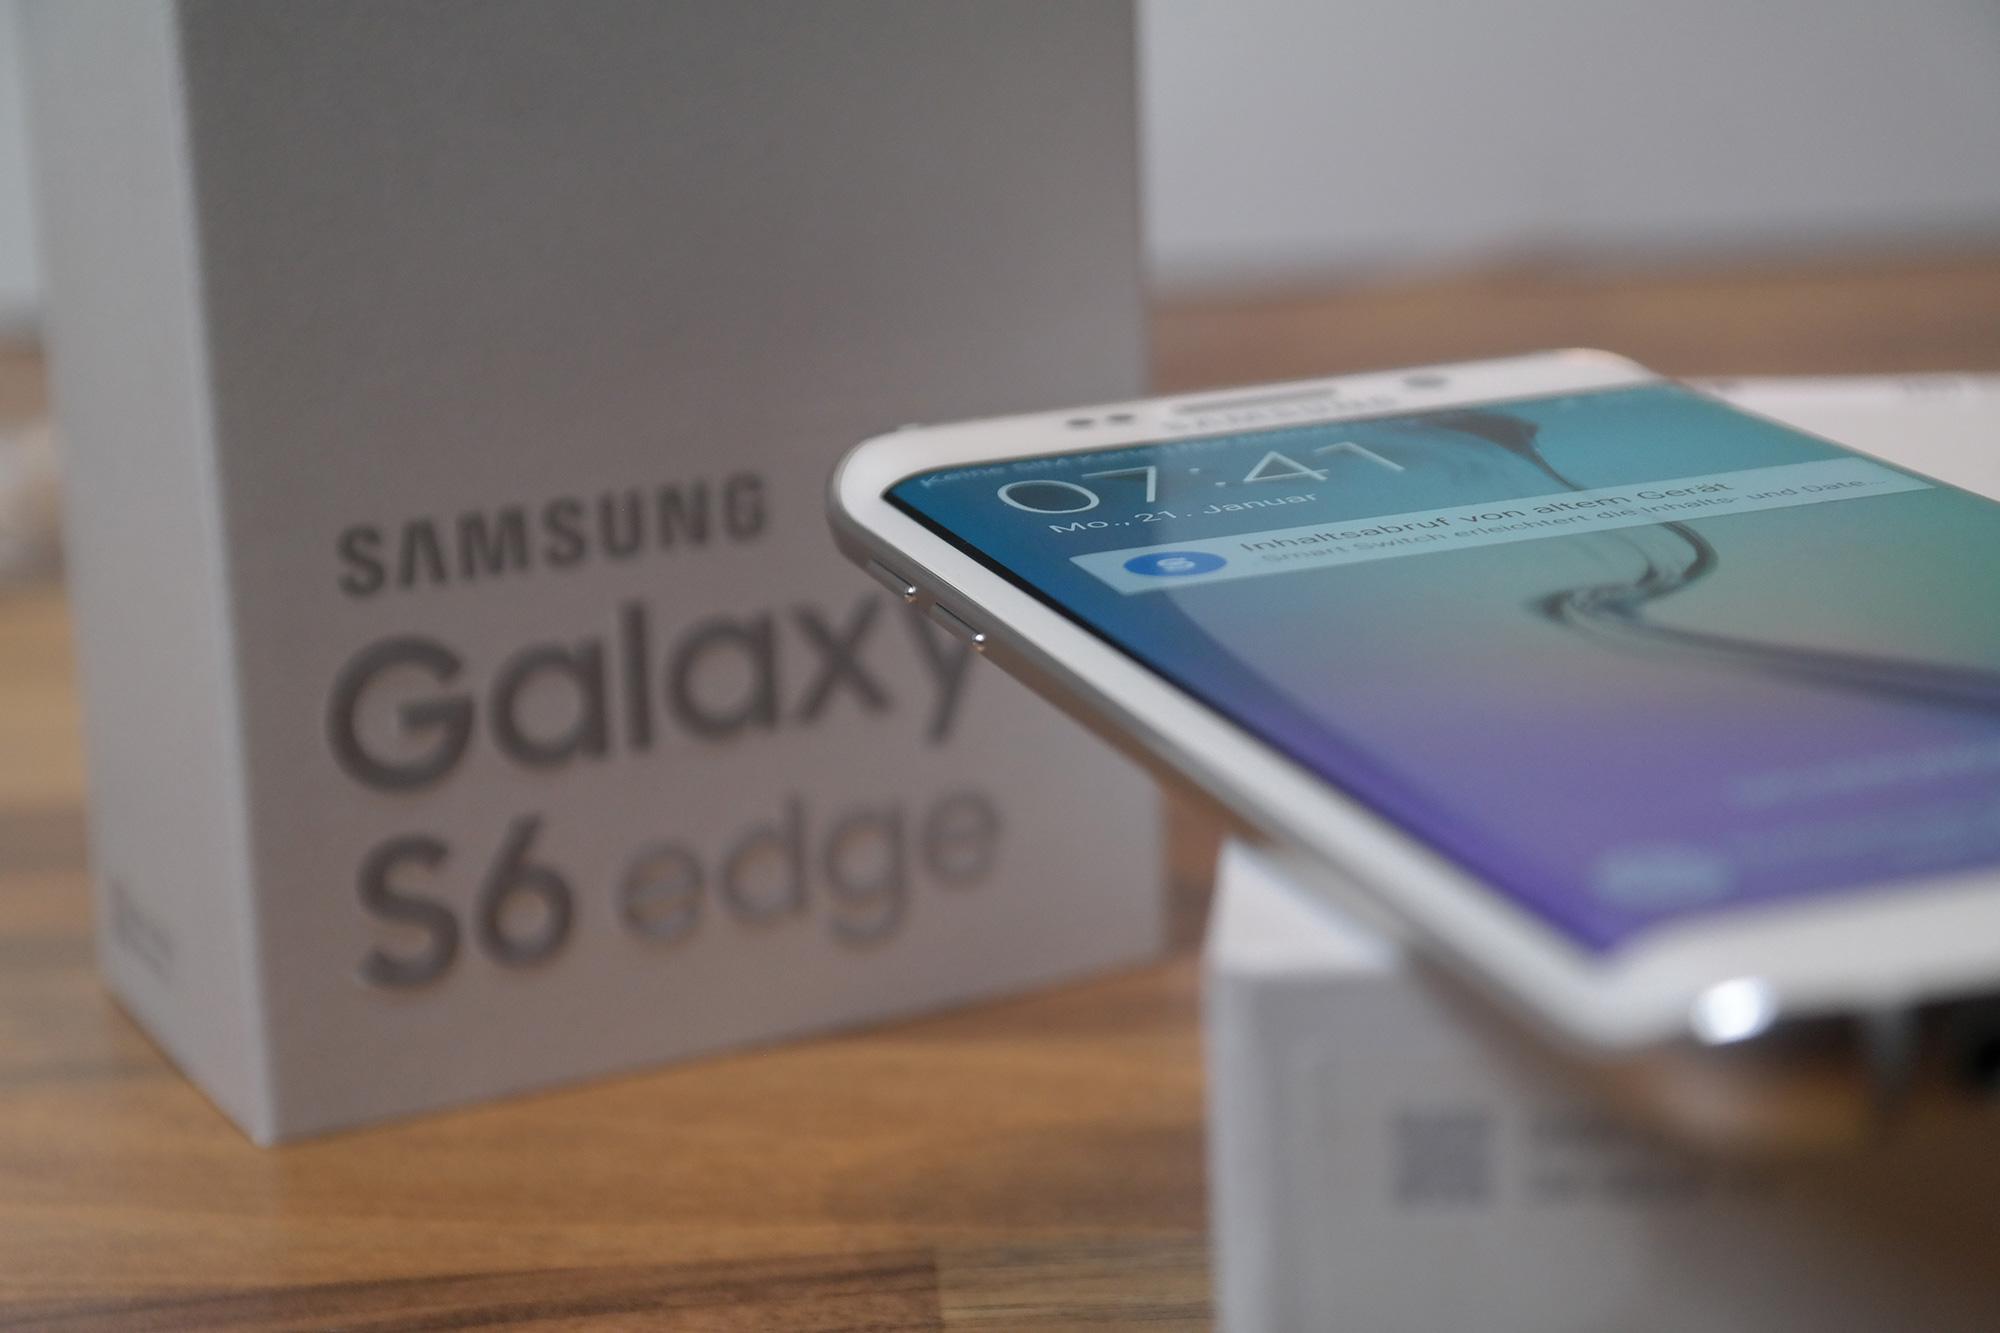 Samsung_Galaxy_S6edge_Unboxing_1